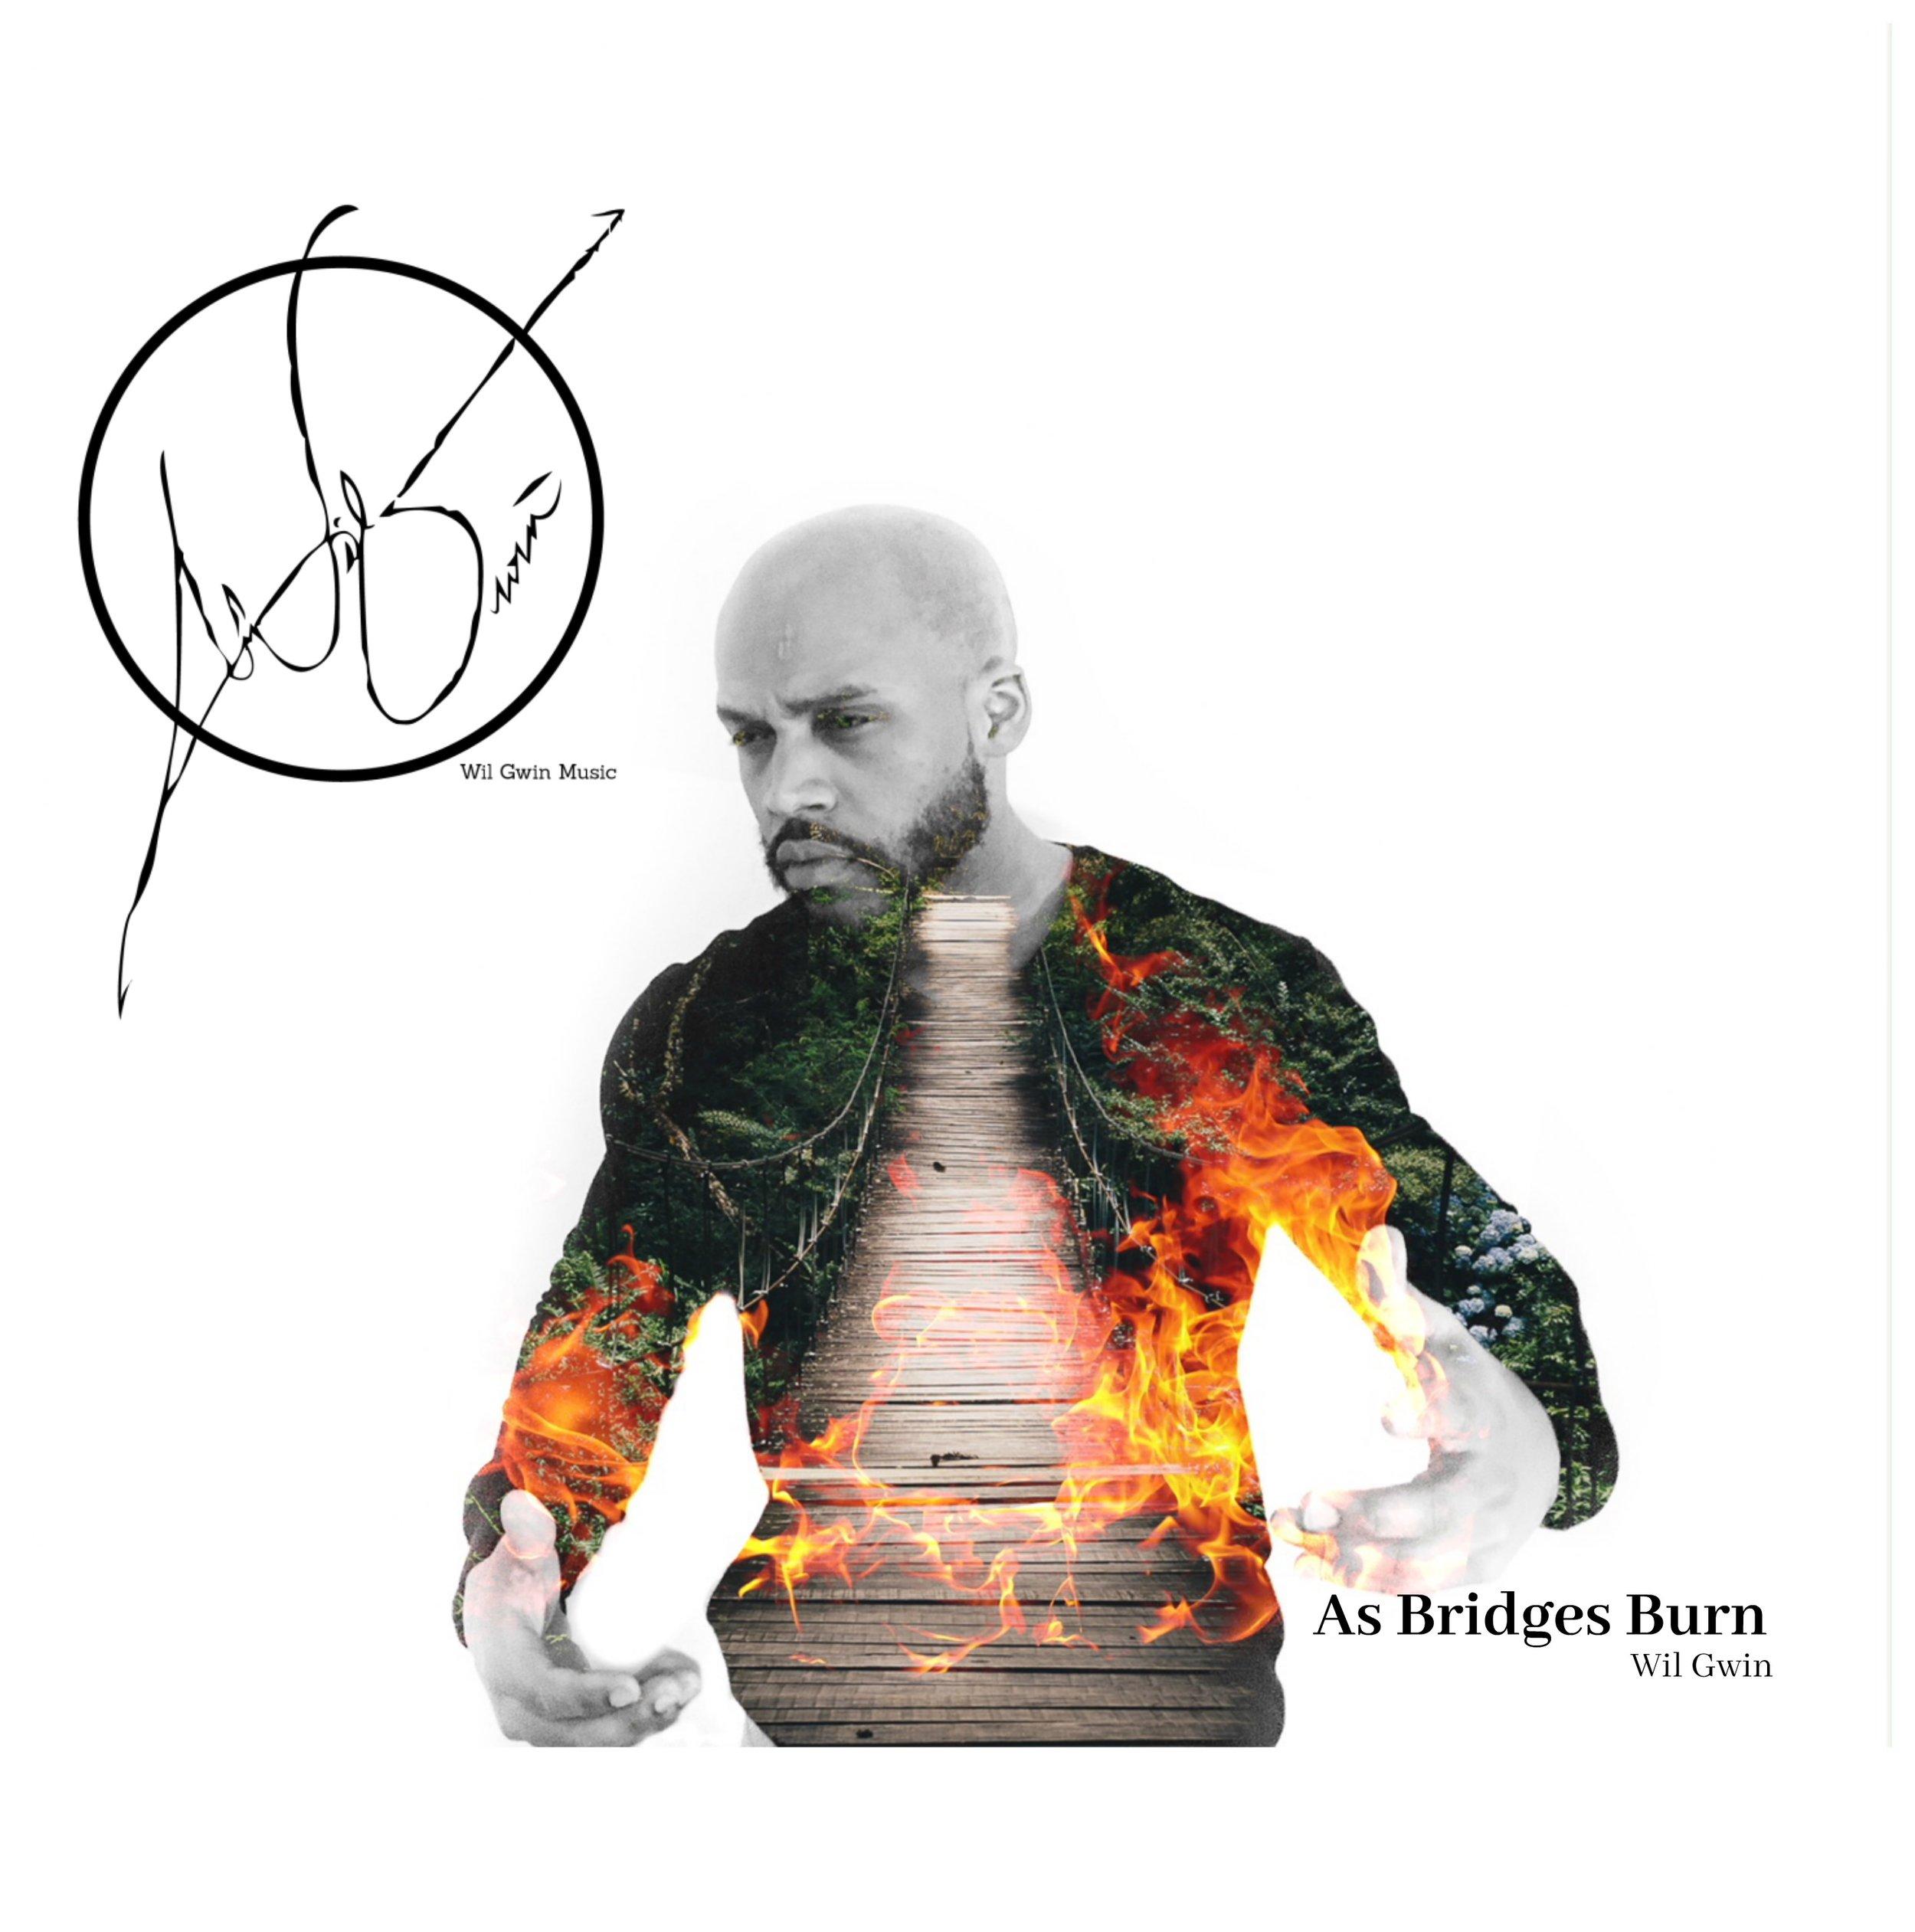 As Bridges Burn album cover6.jpg